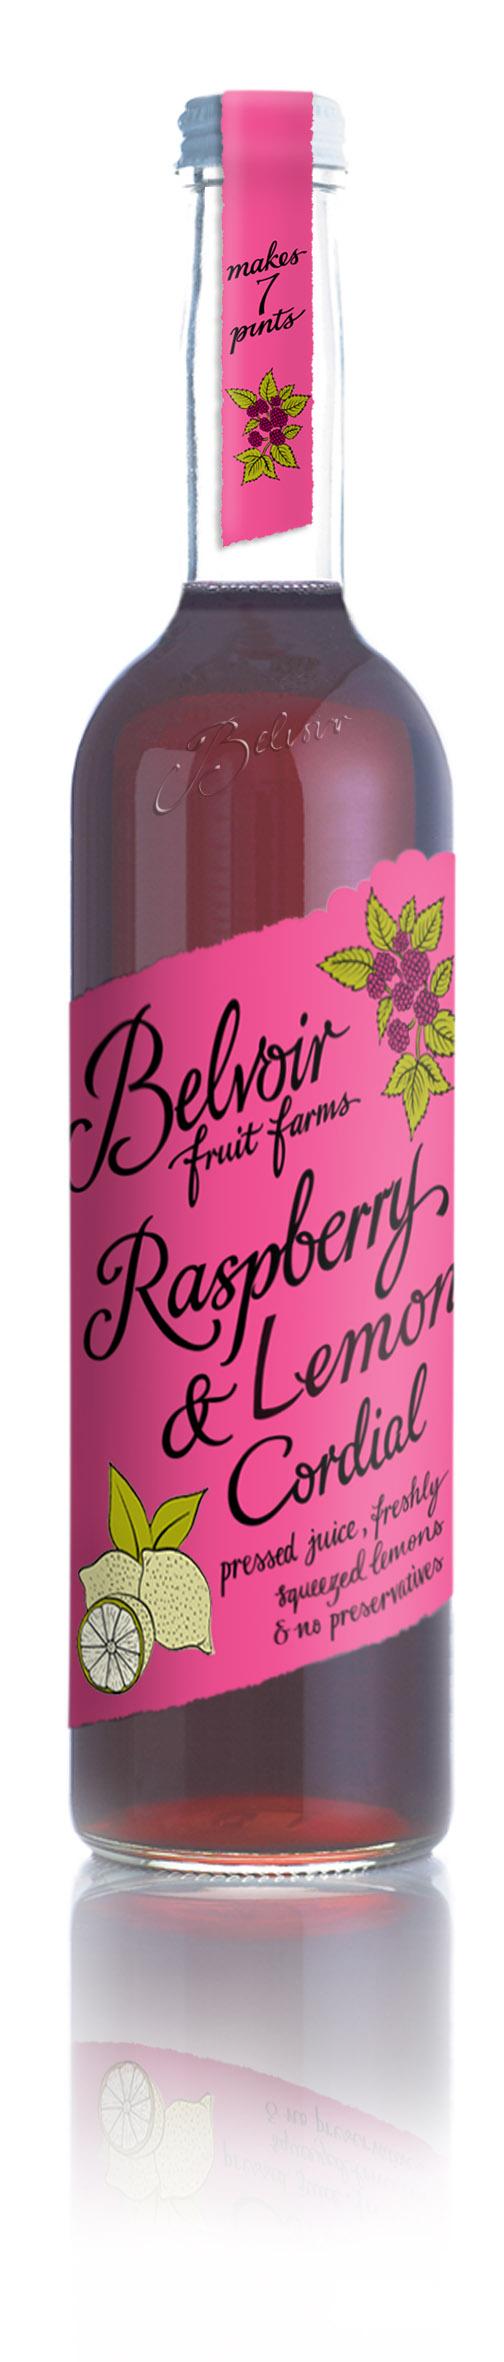 Raspberry & Lemon Cordial